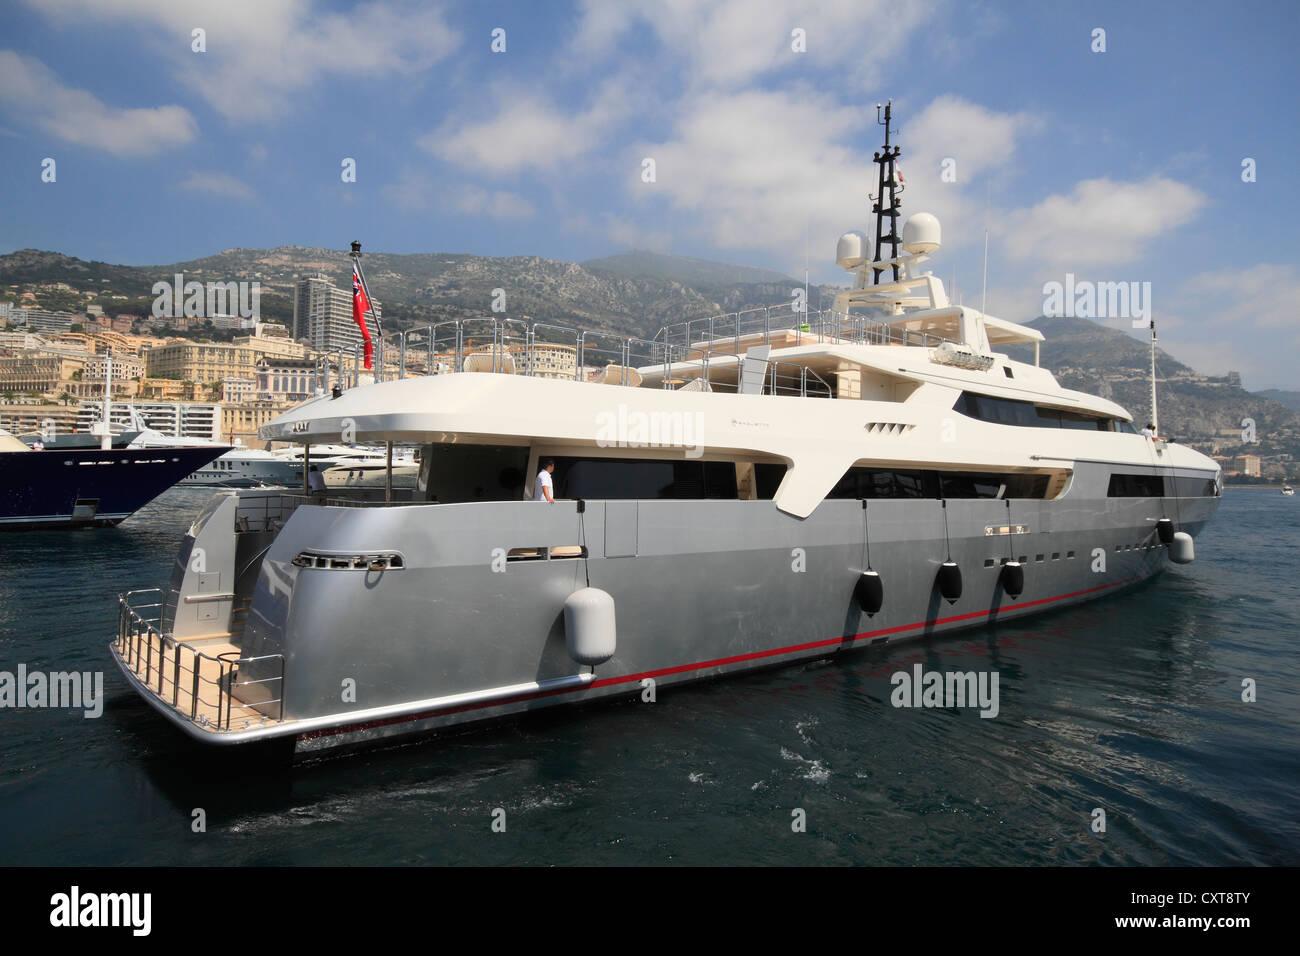 Motor yacht Vicky leaving the Port Hercule in Monaco, shipyard Baglietto, length 58, 40 meters, built in 2008 - Stock Image